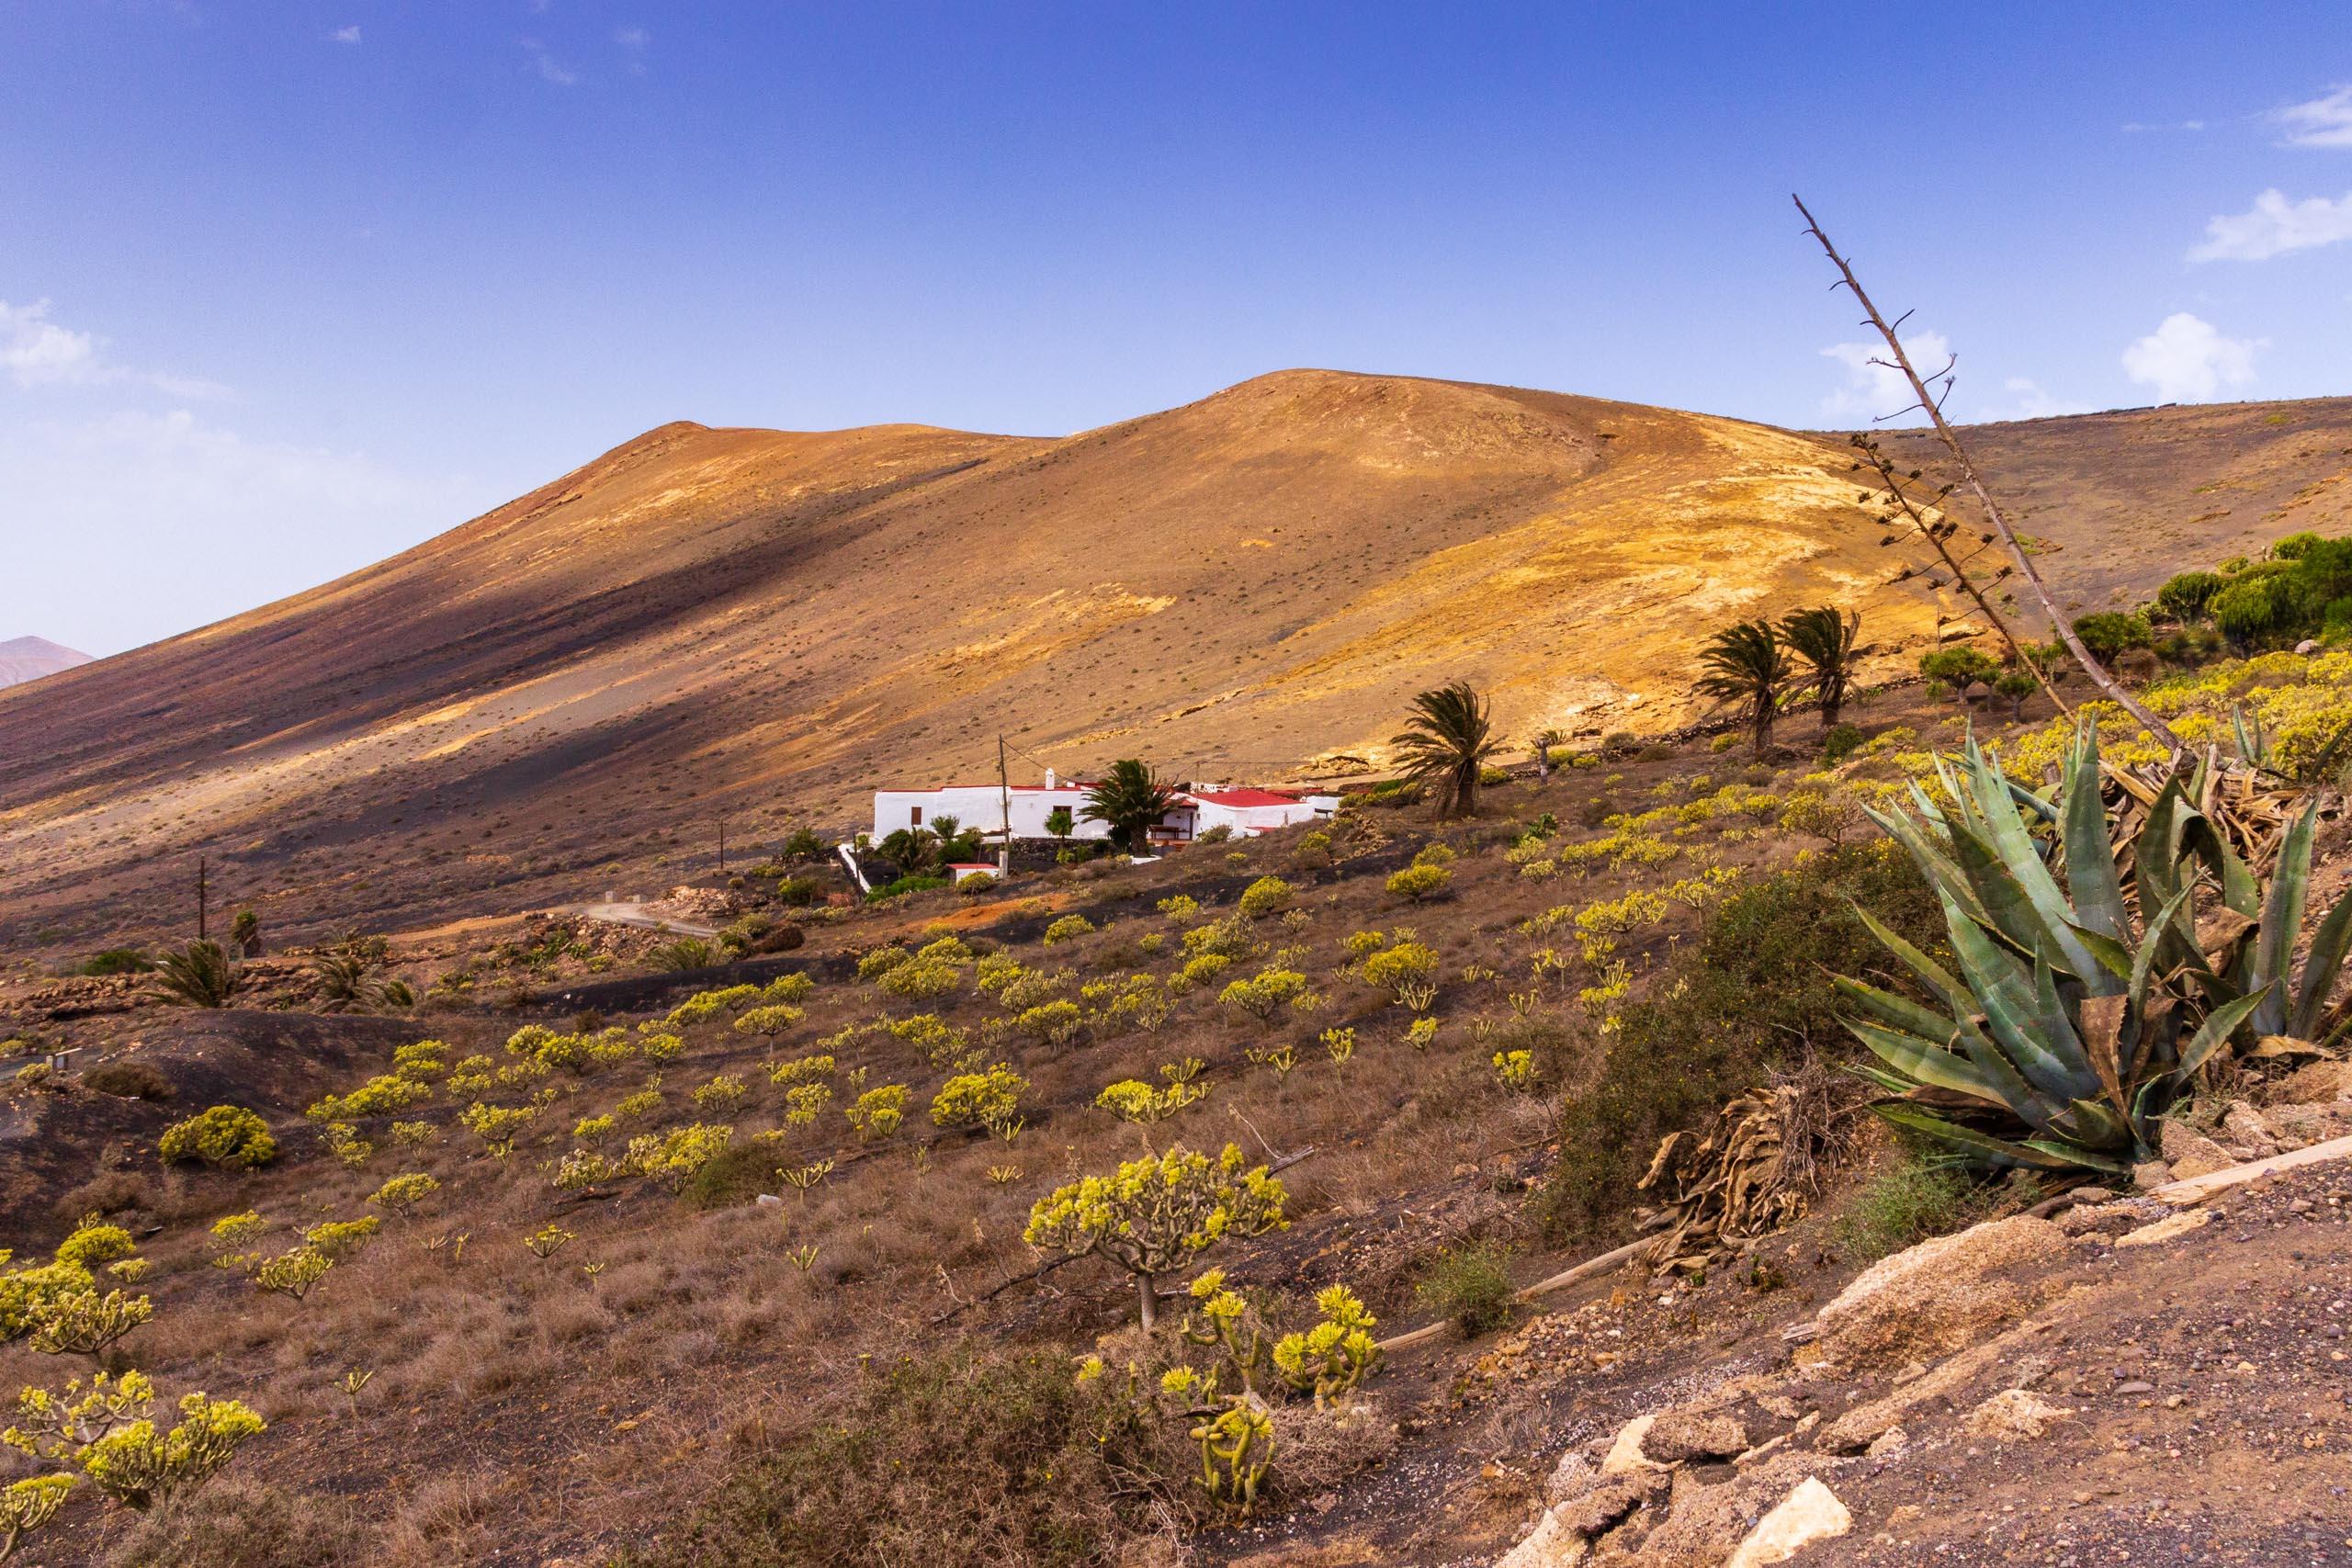 2018 08 Lanzarote AboveMacher 002